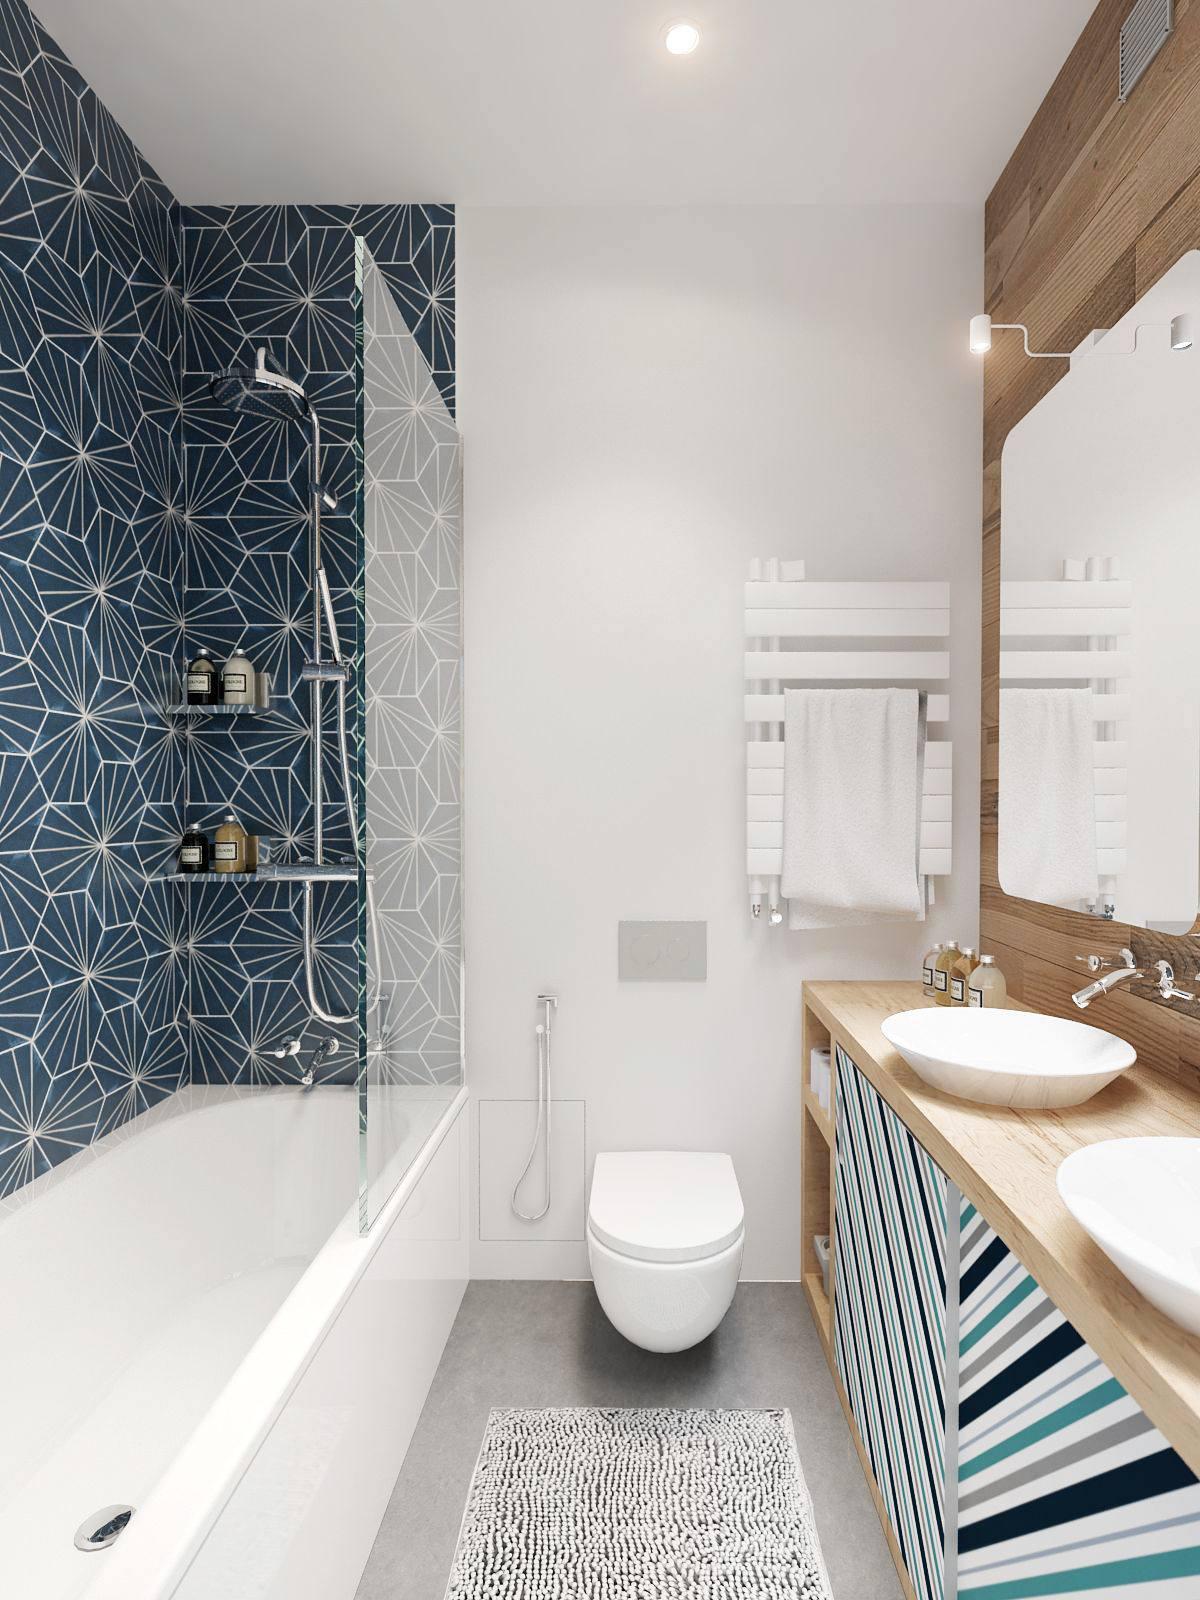 интерьер ванной комнаты фото 6